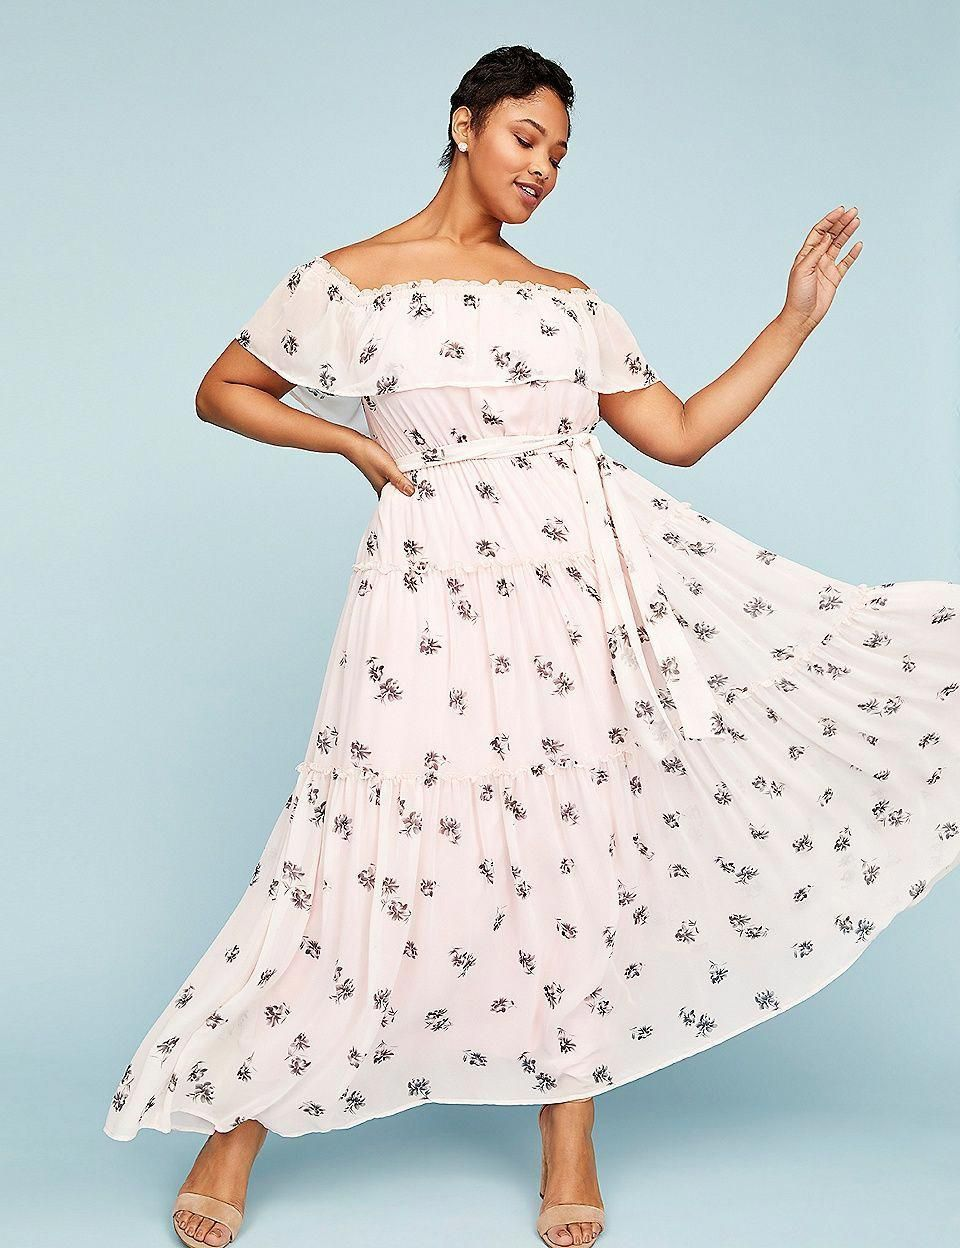 4bcd13b4db4 Cute Plus Size Sundresses For Spring Summer 2018  womensfashionplussizefat